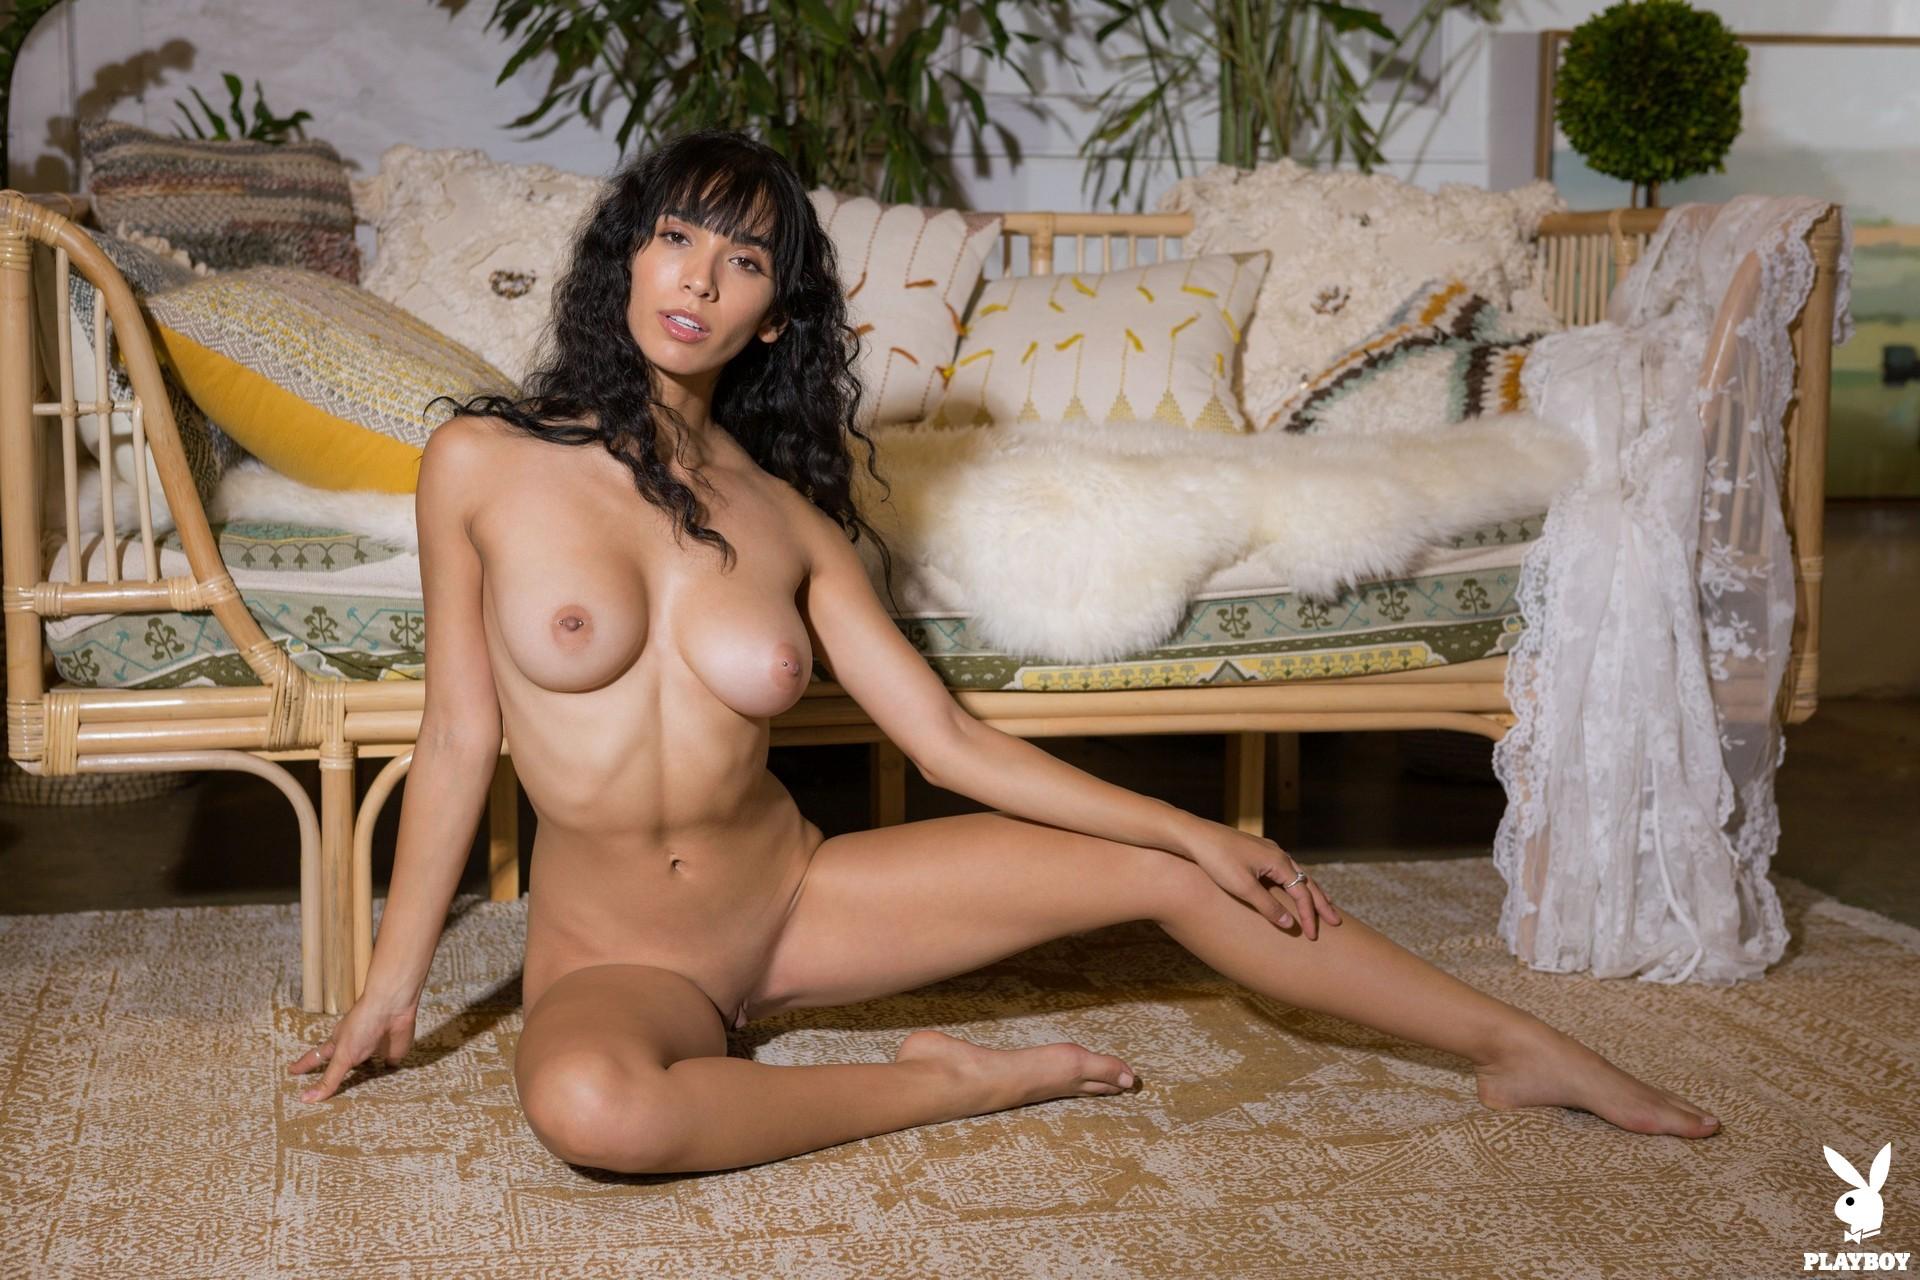 Erika De Leija in Perfect Daydream - Playboy Plus 20